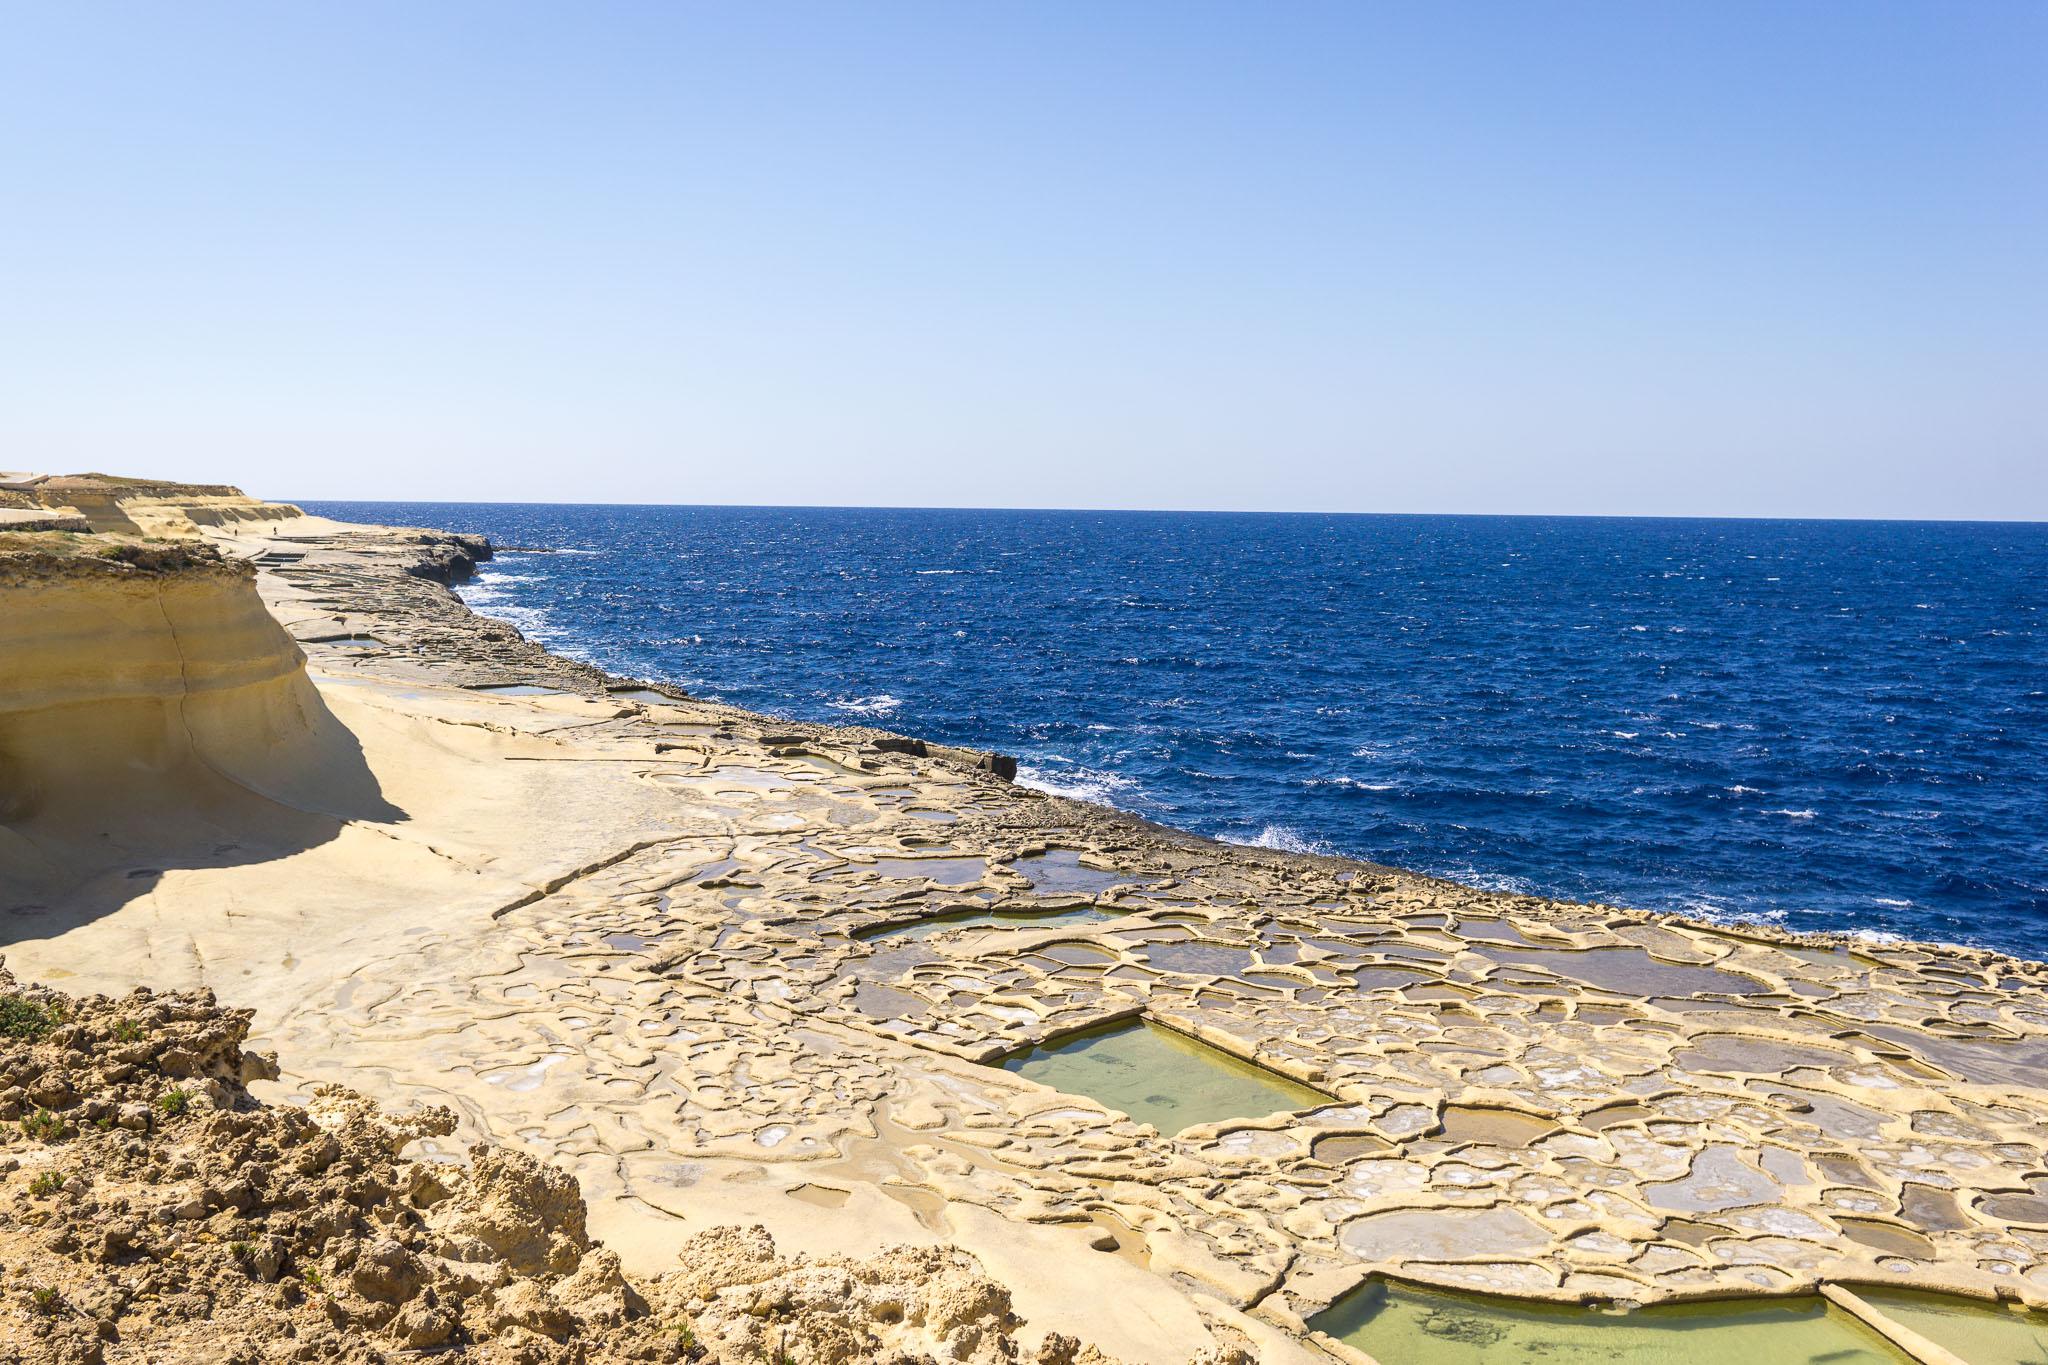 The Salt Pans on Gozo.